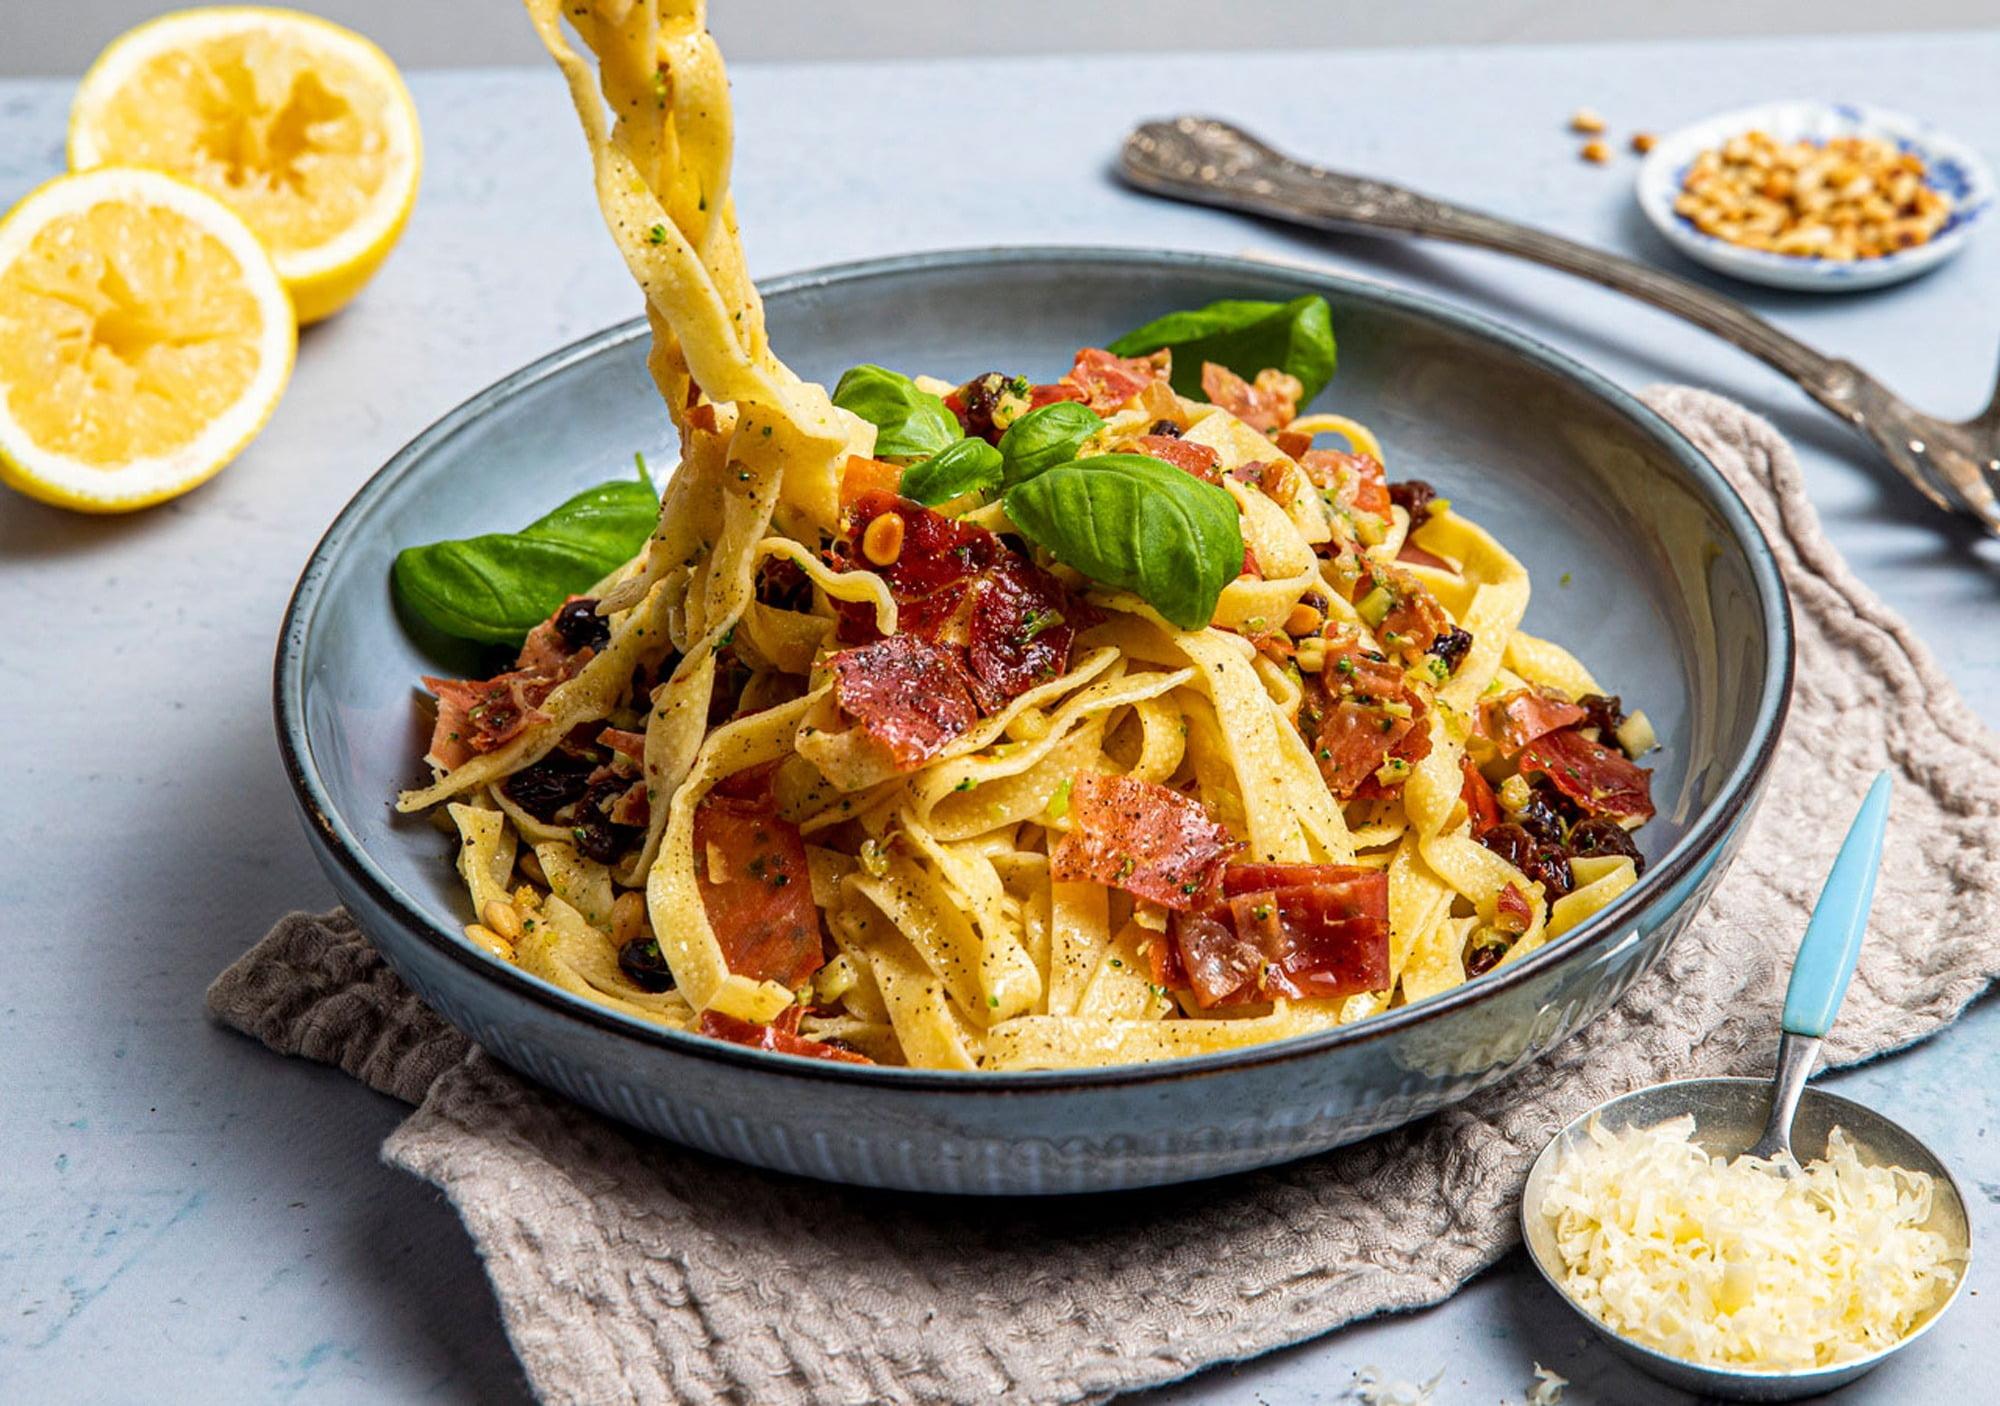 Staple food, Tableware, Rangpur, Ingredient, Yellow, Recipe, Cuisine, Plate, Noodle